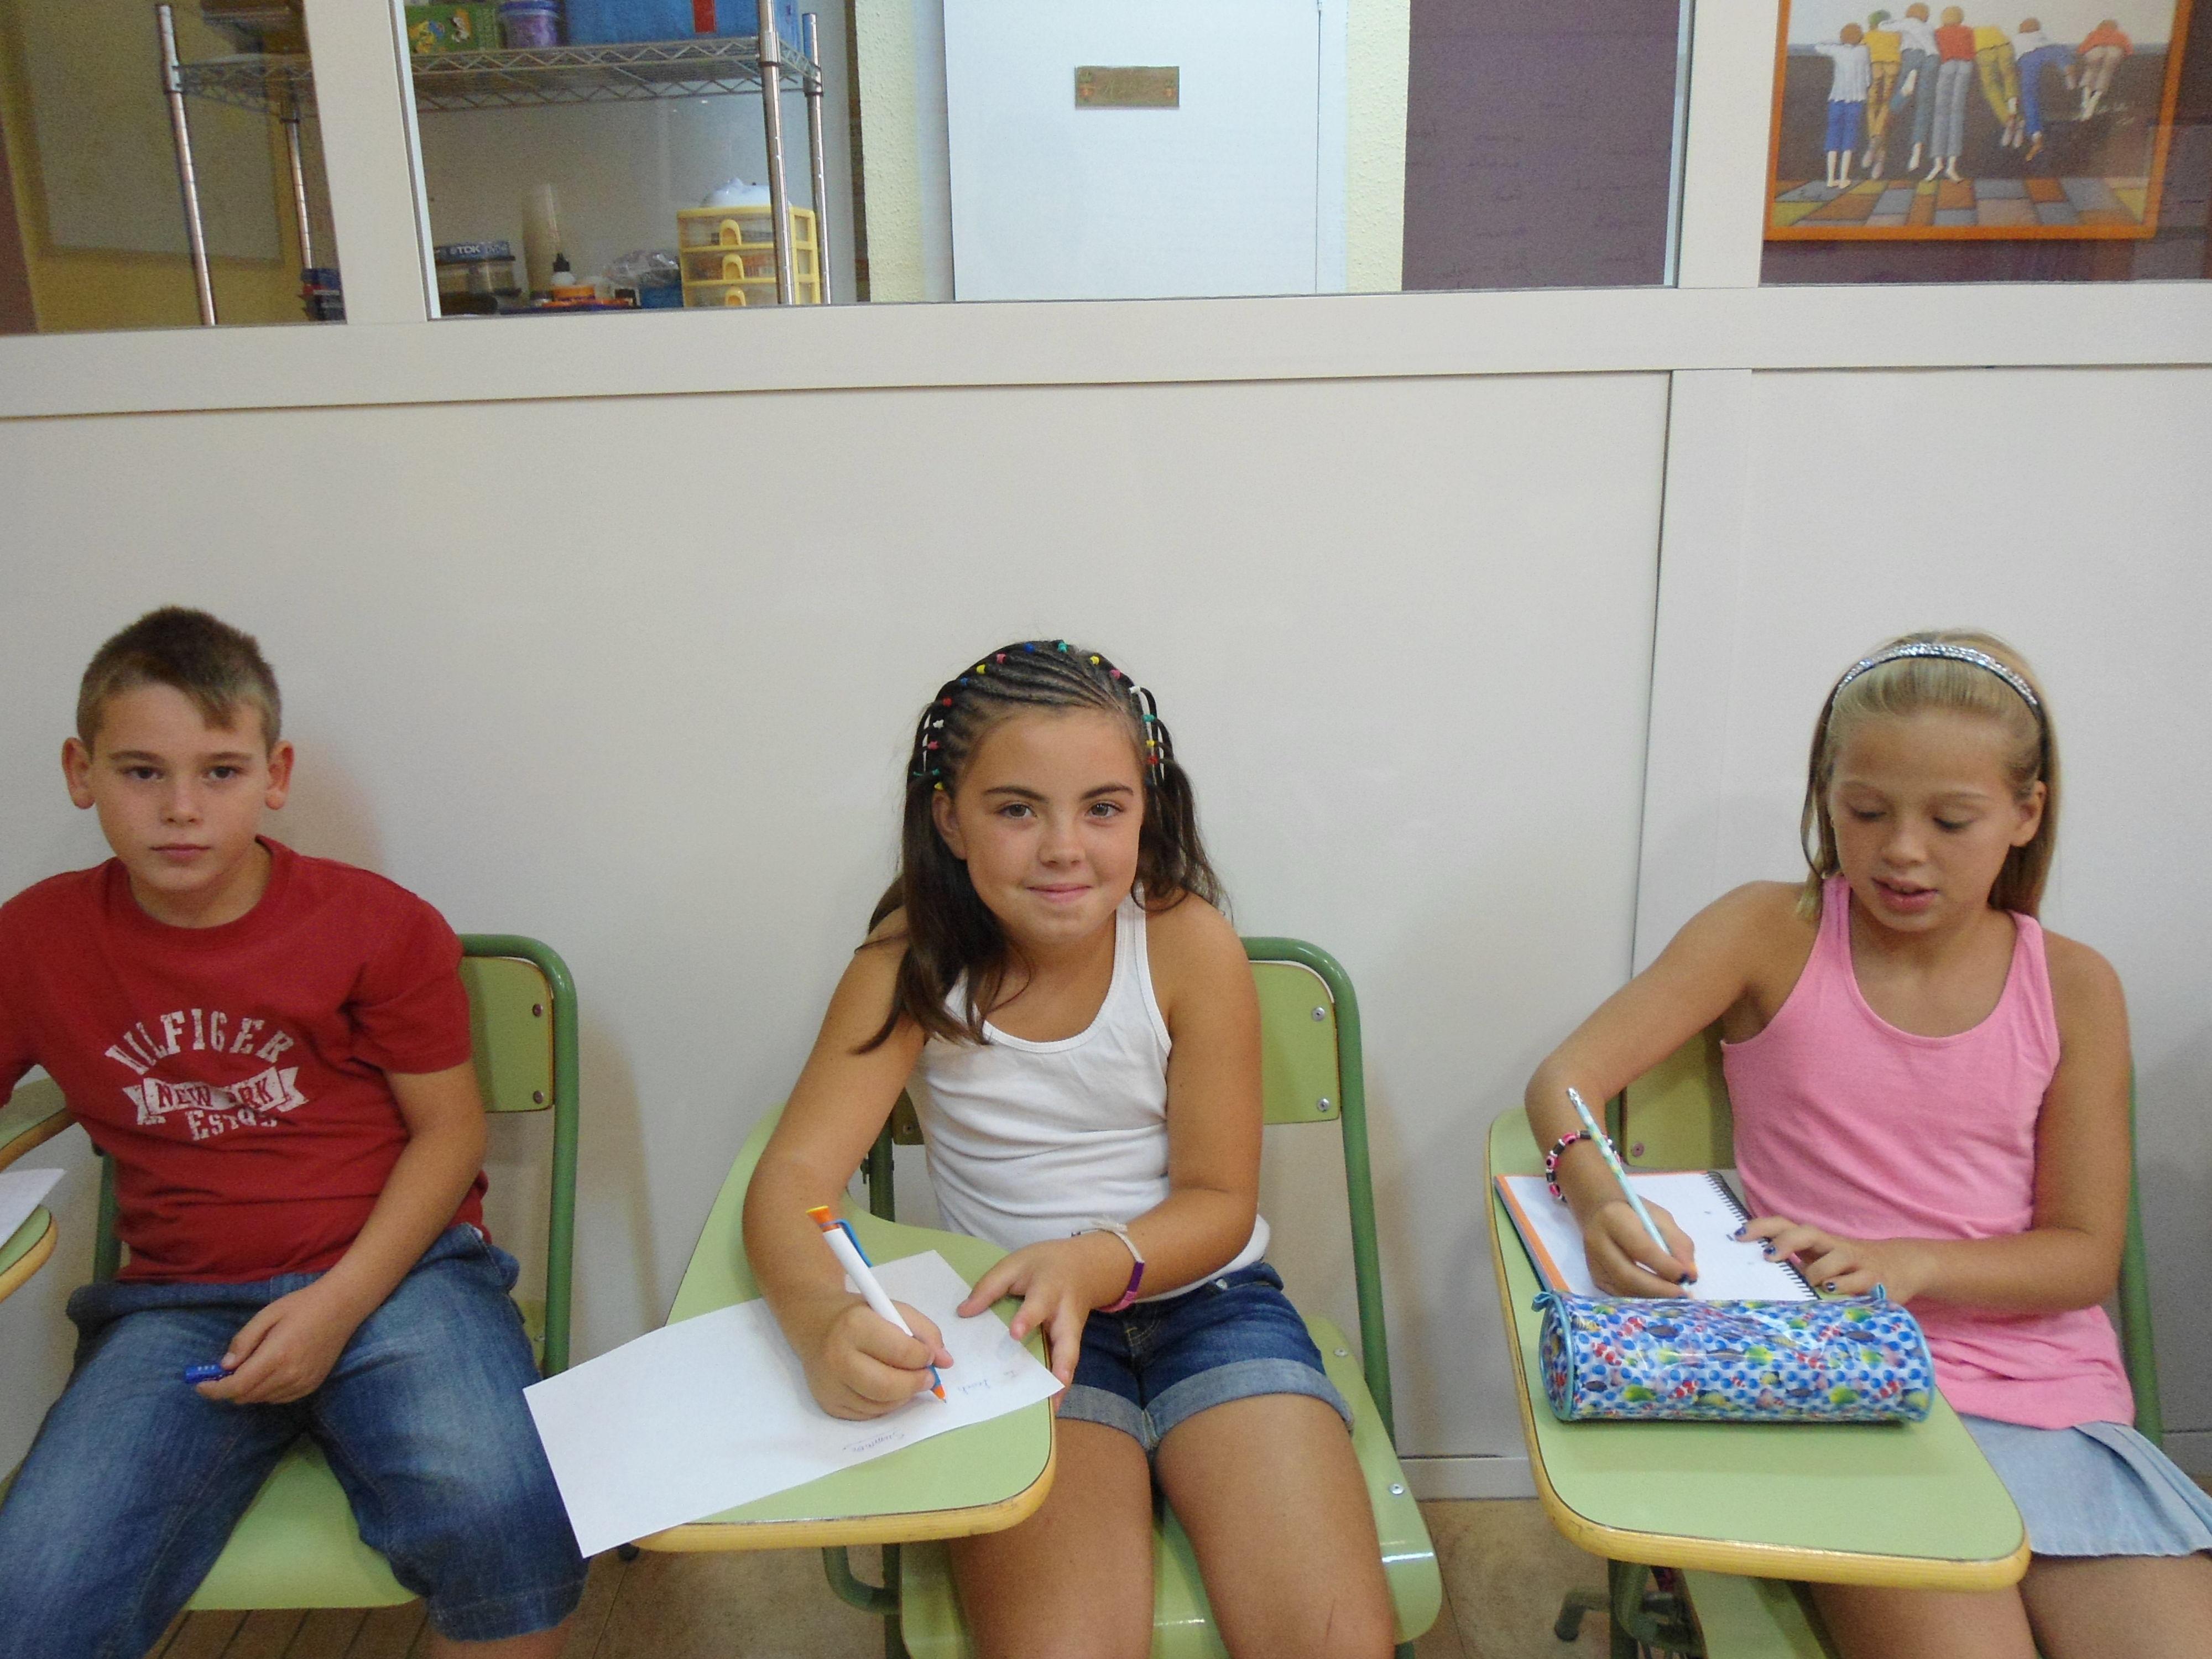 Foto 30 de Academias de idiomas en Moncada | Centre d'Estudis Etnies